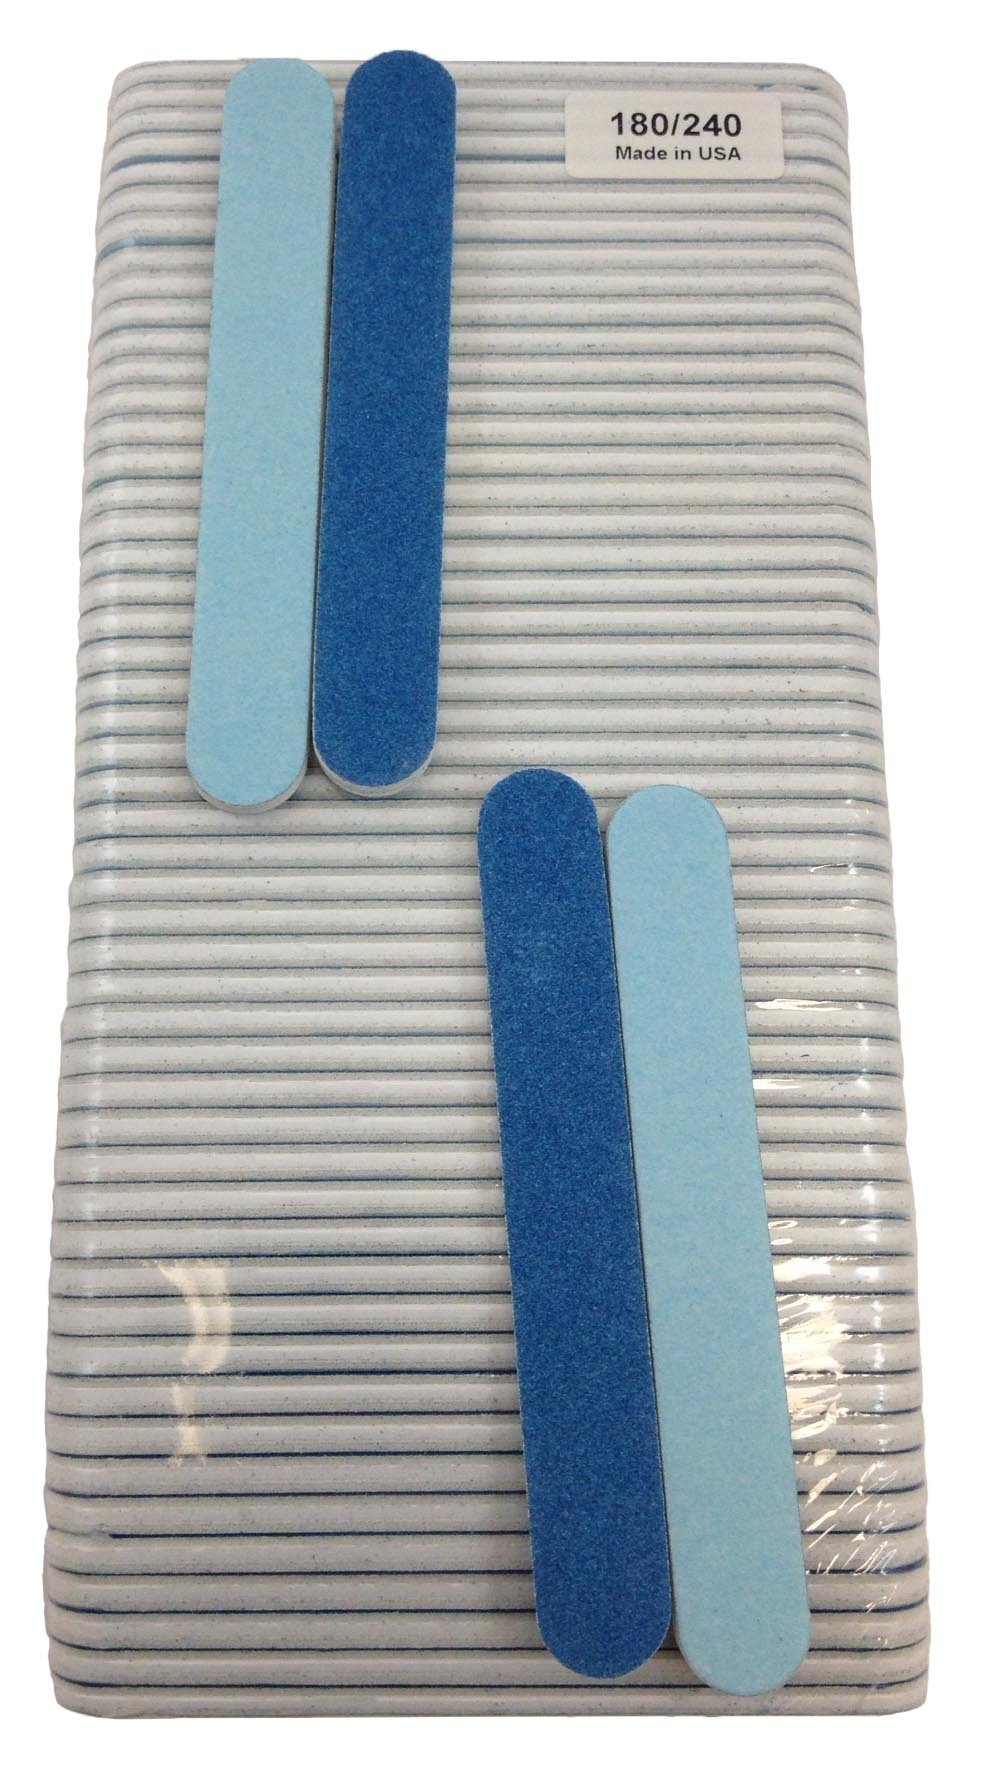 Iridesi Professional Mini Blue Finger Nail Files 120/240 Washable Emery Boards 3-1/2 Inches Long 50 Fingernail Files Per Pack